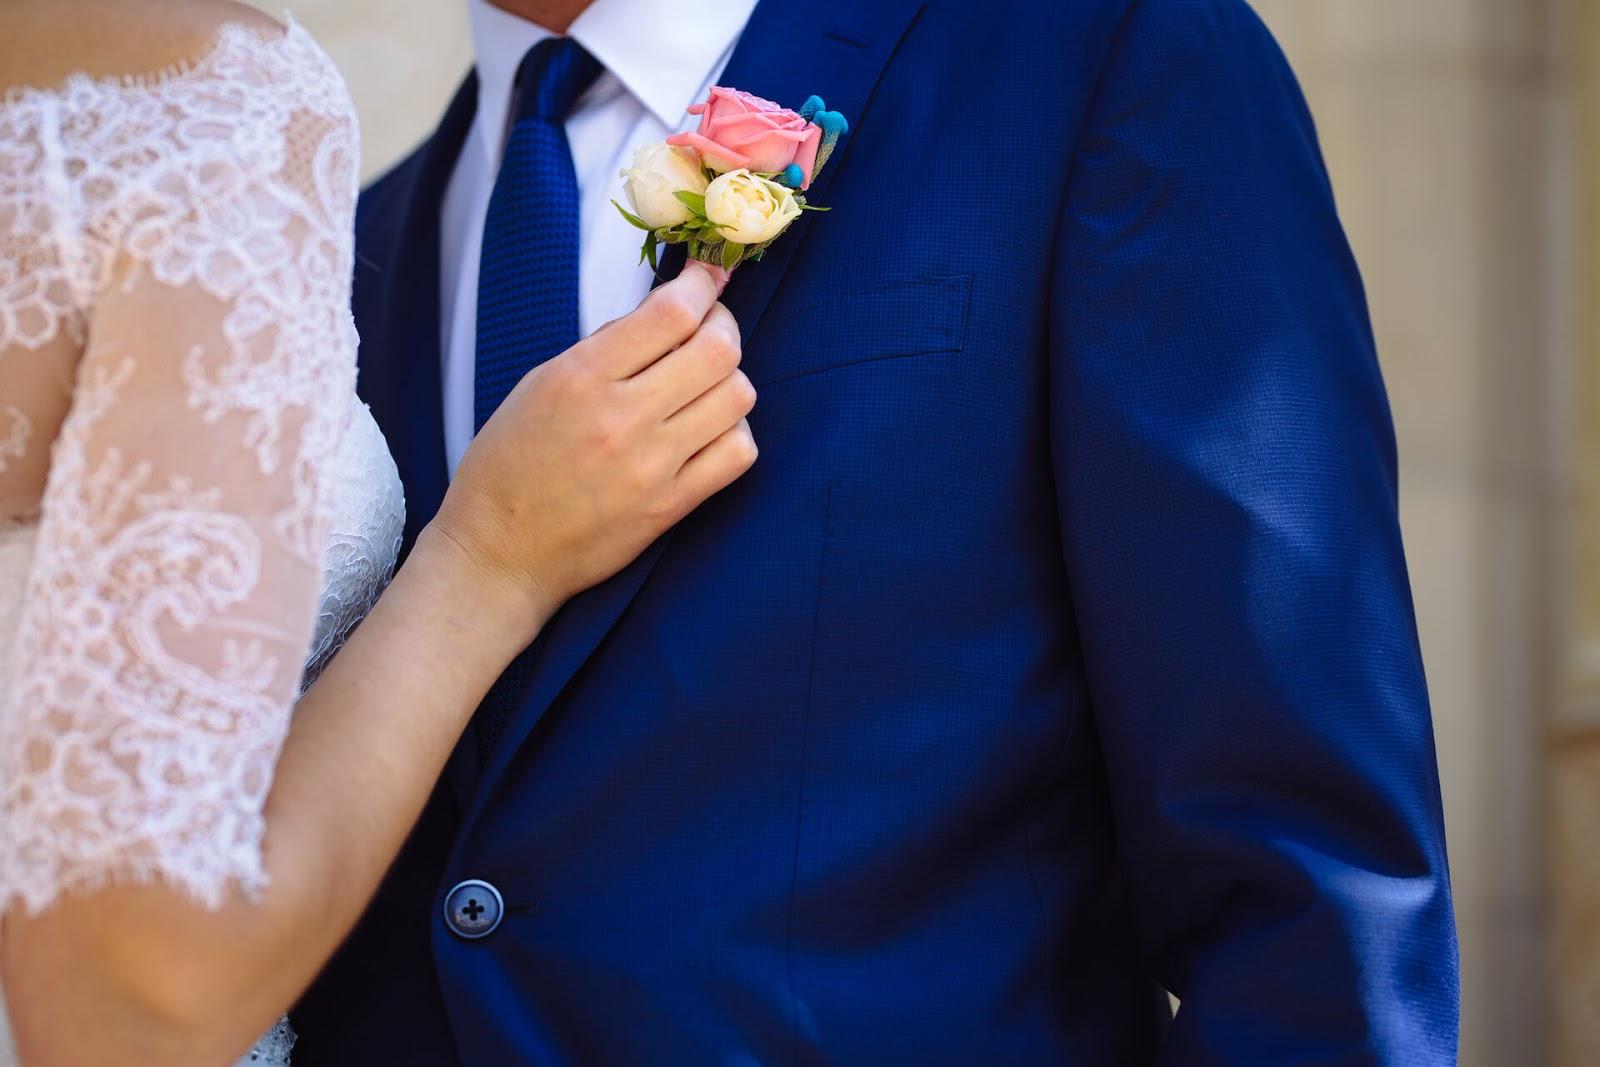 Woman straightening man's corsage